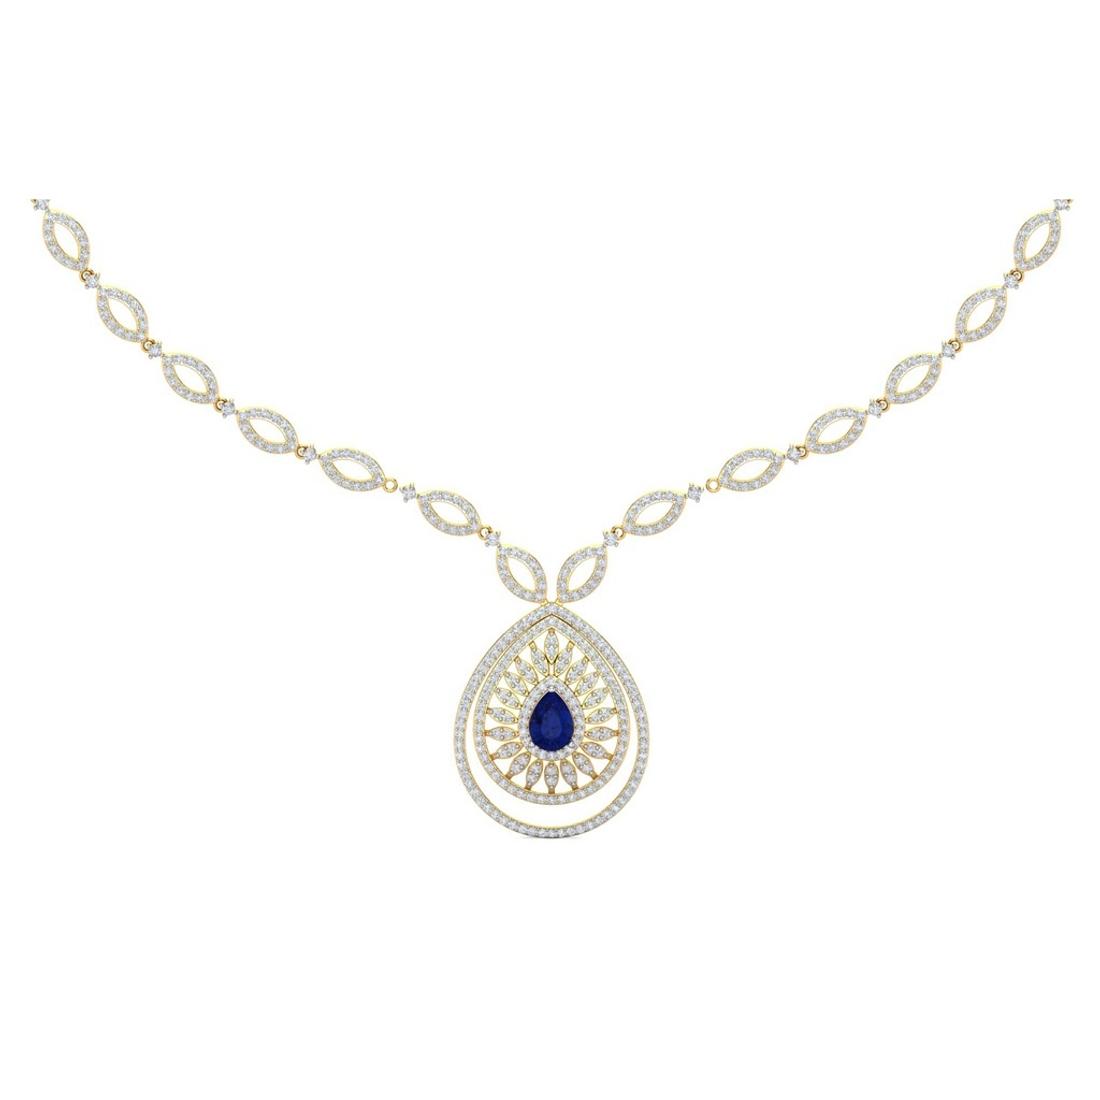 Sarvada Jewels' The Belinda Diamond Necklace